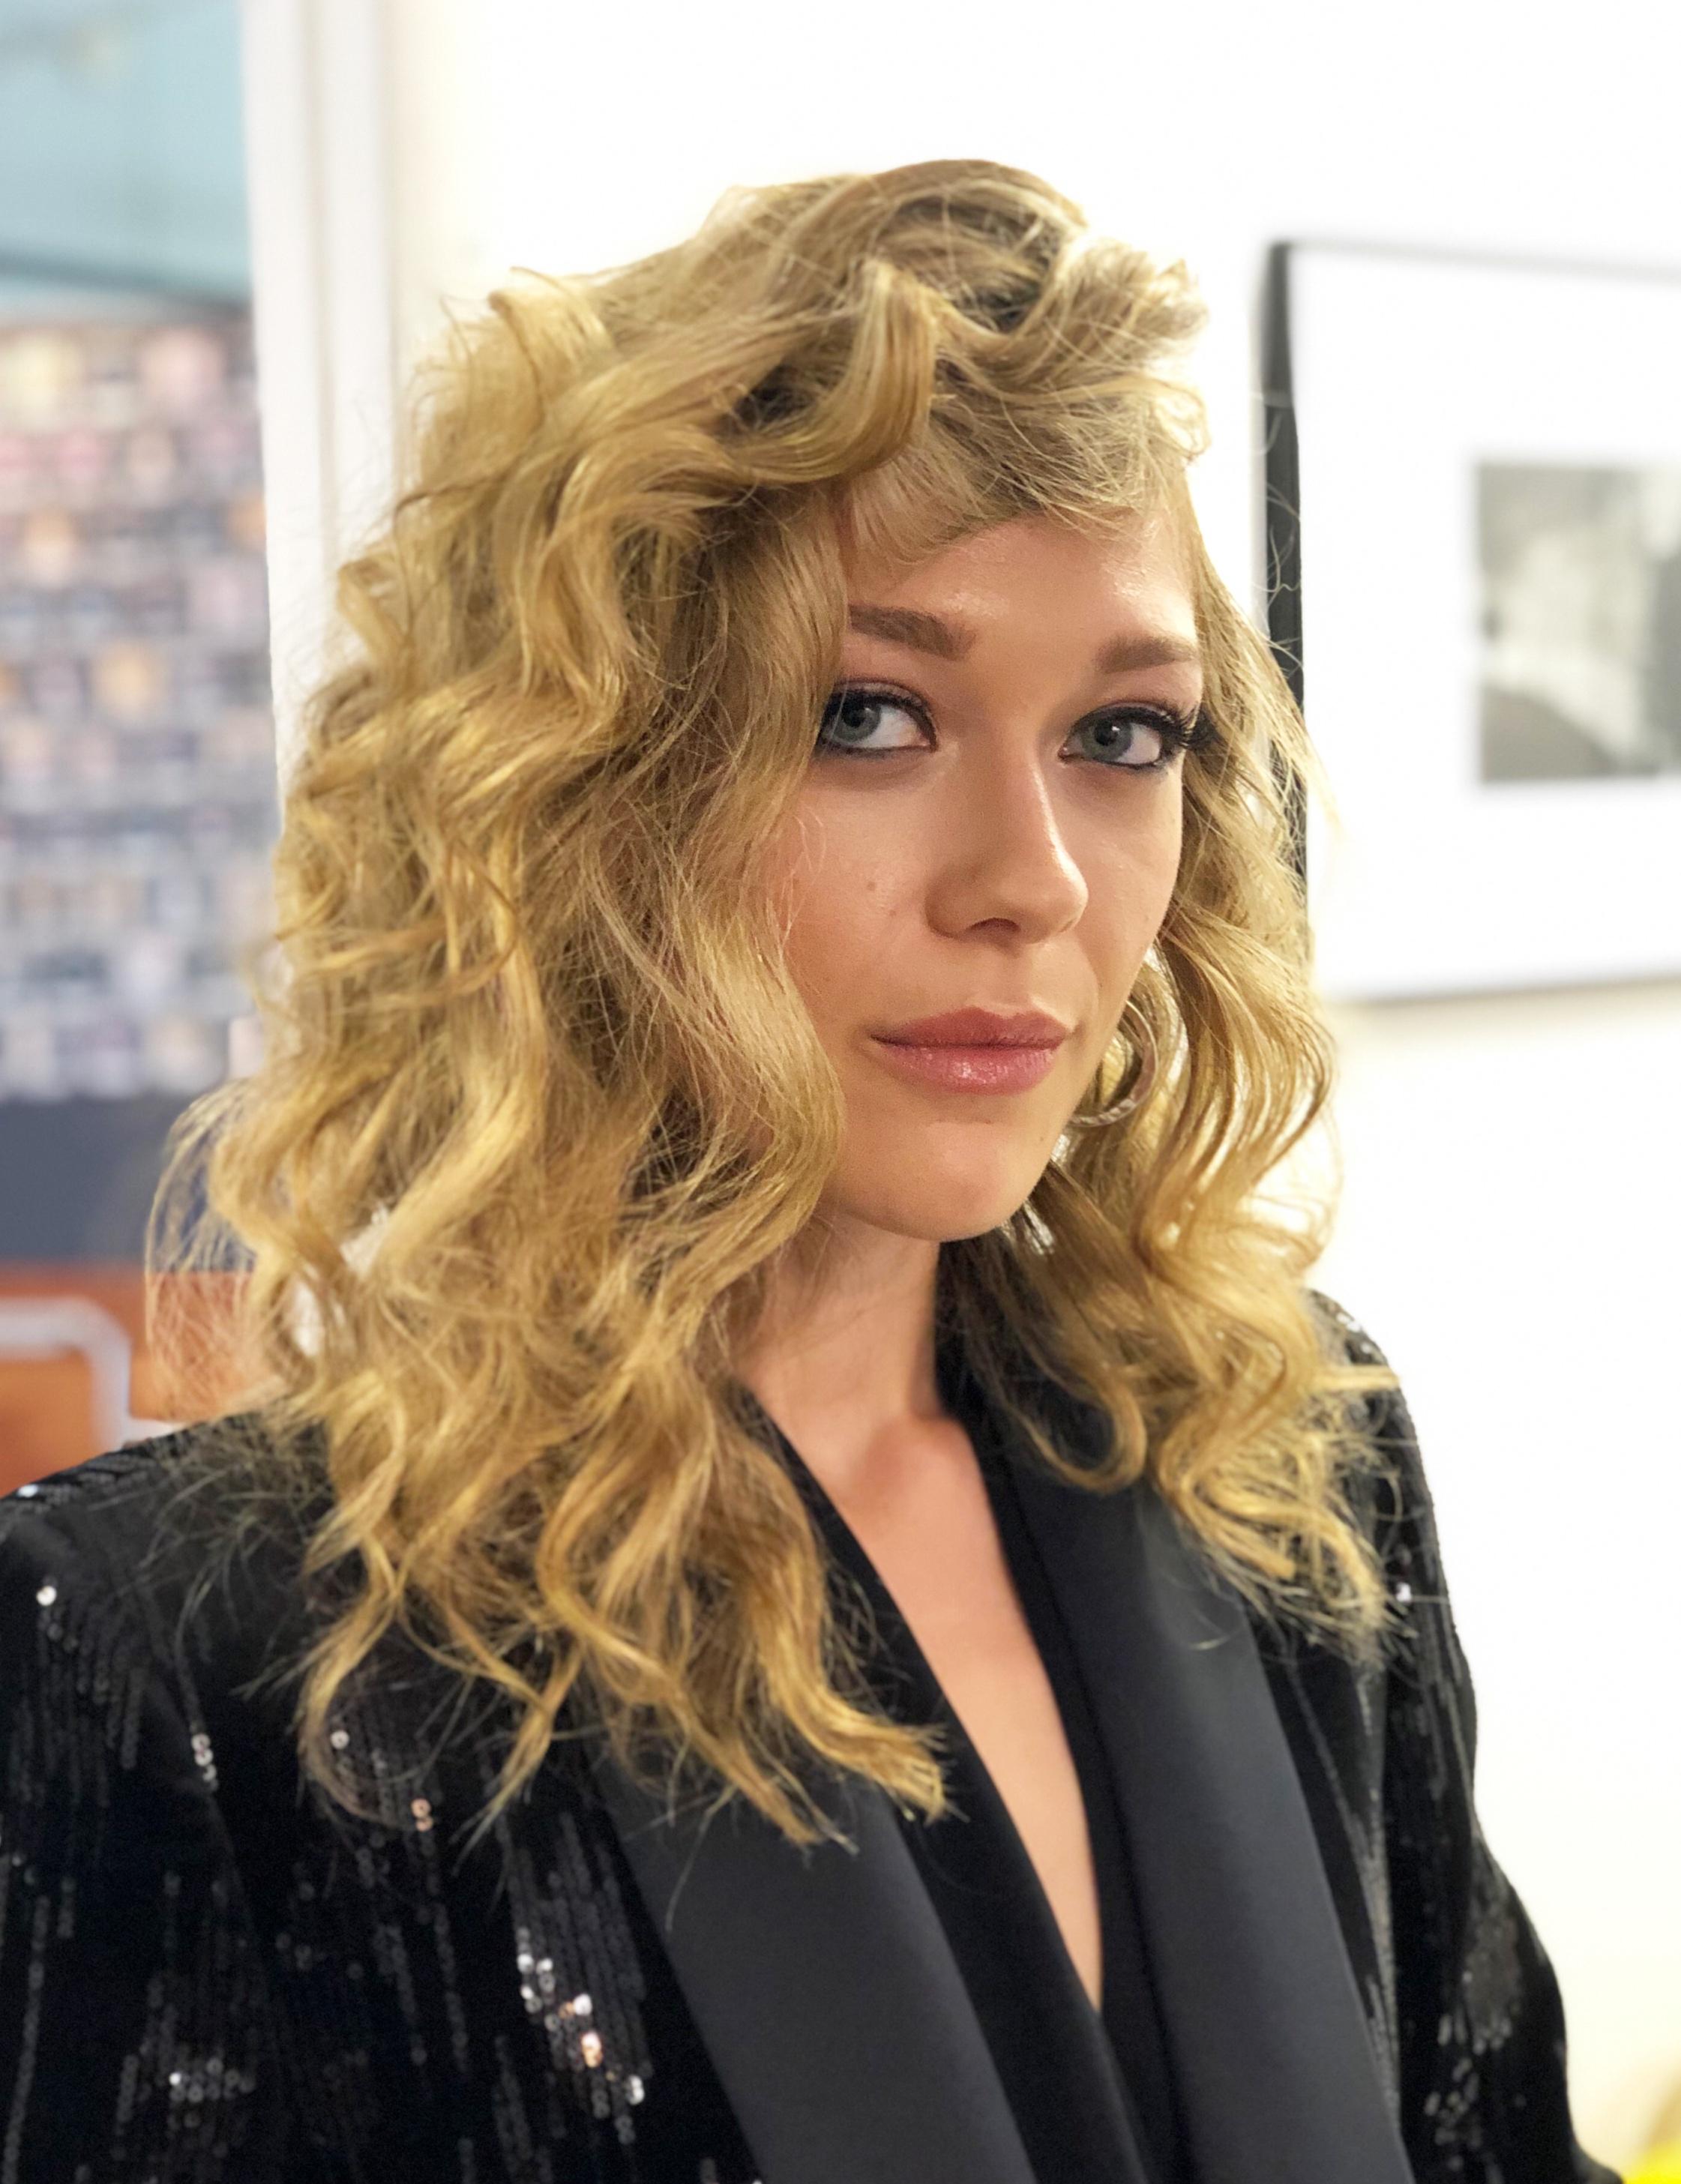 Hair and Makeup by Nereida Metro Tampa Bay Metro Two